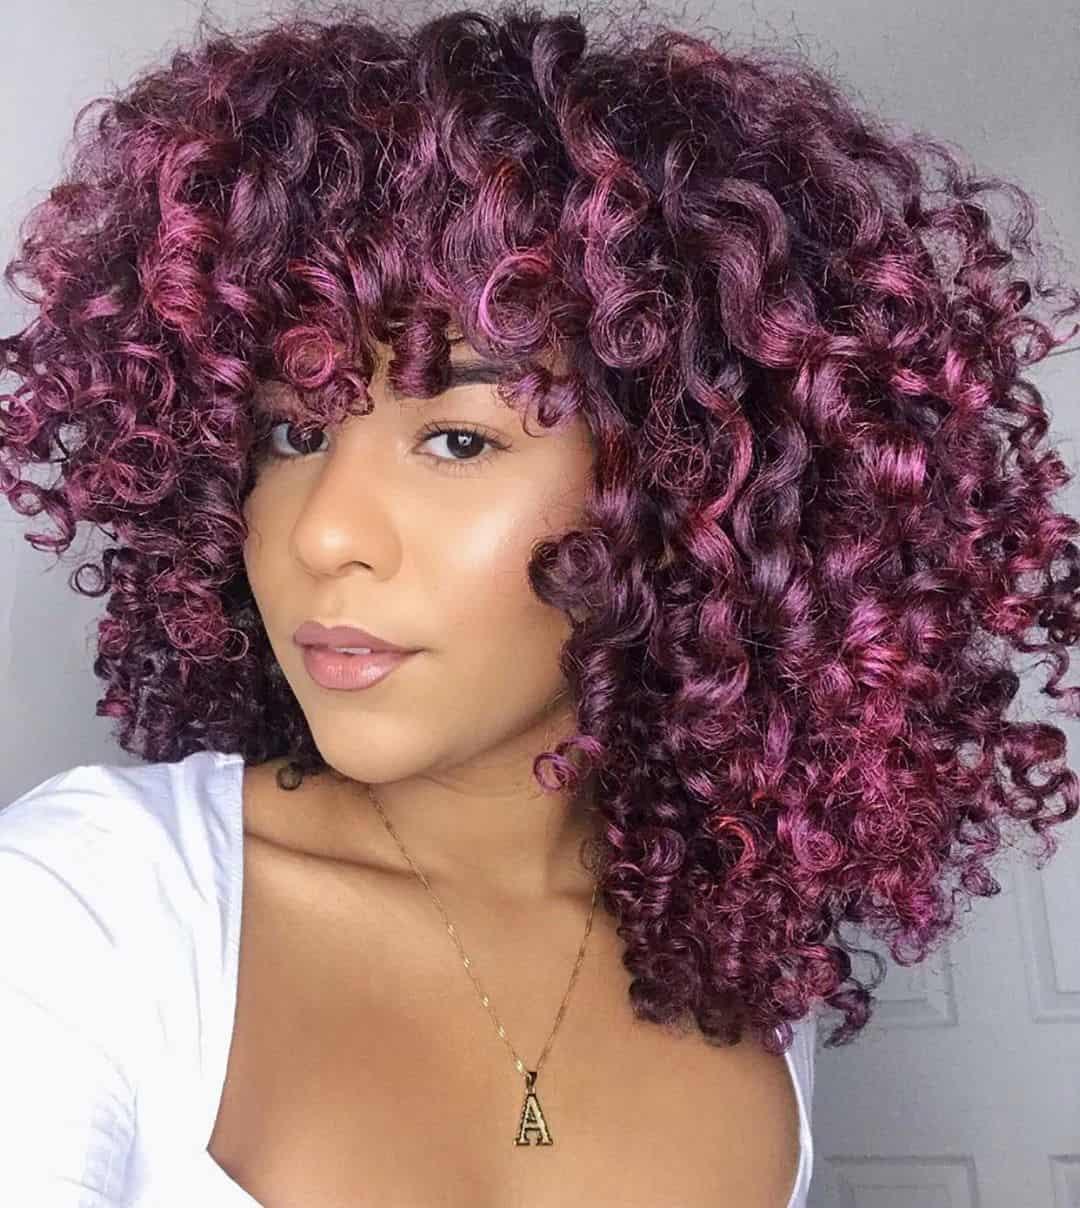 purple hair dye on curly hair